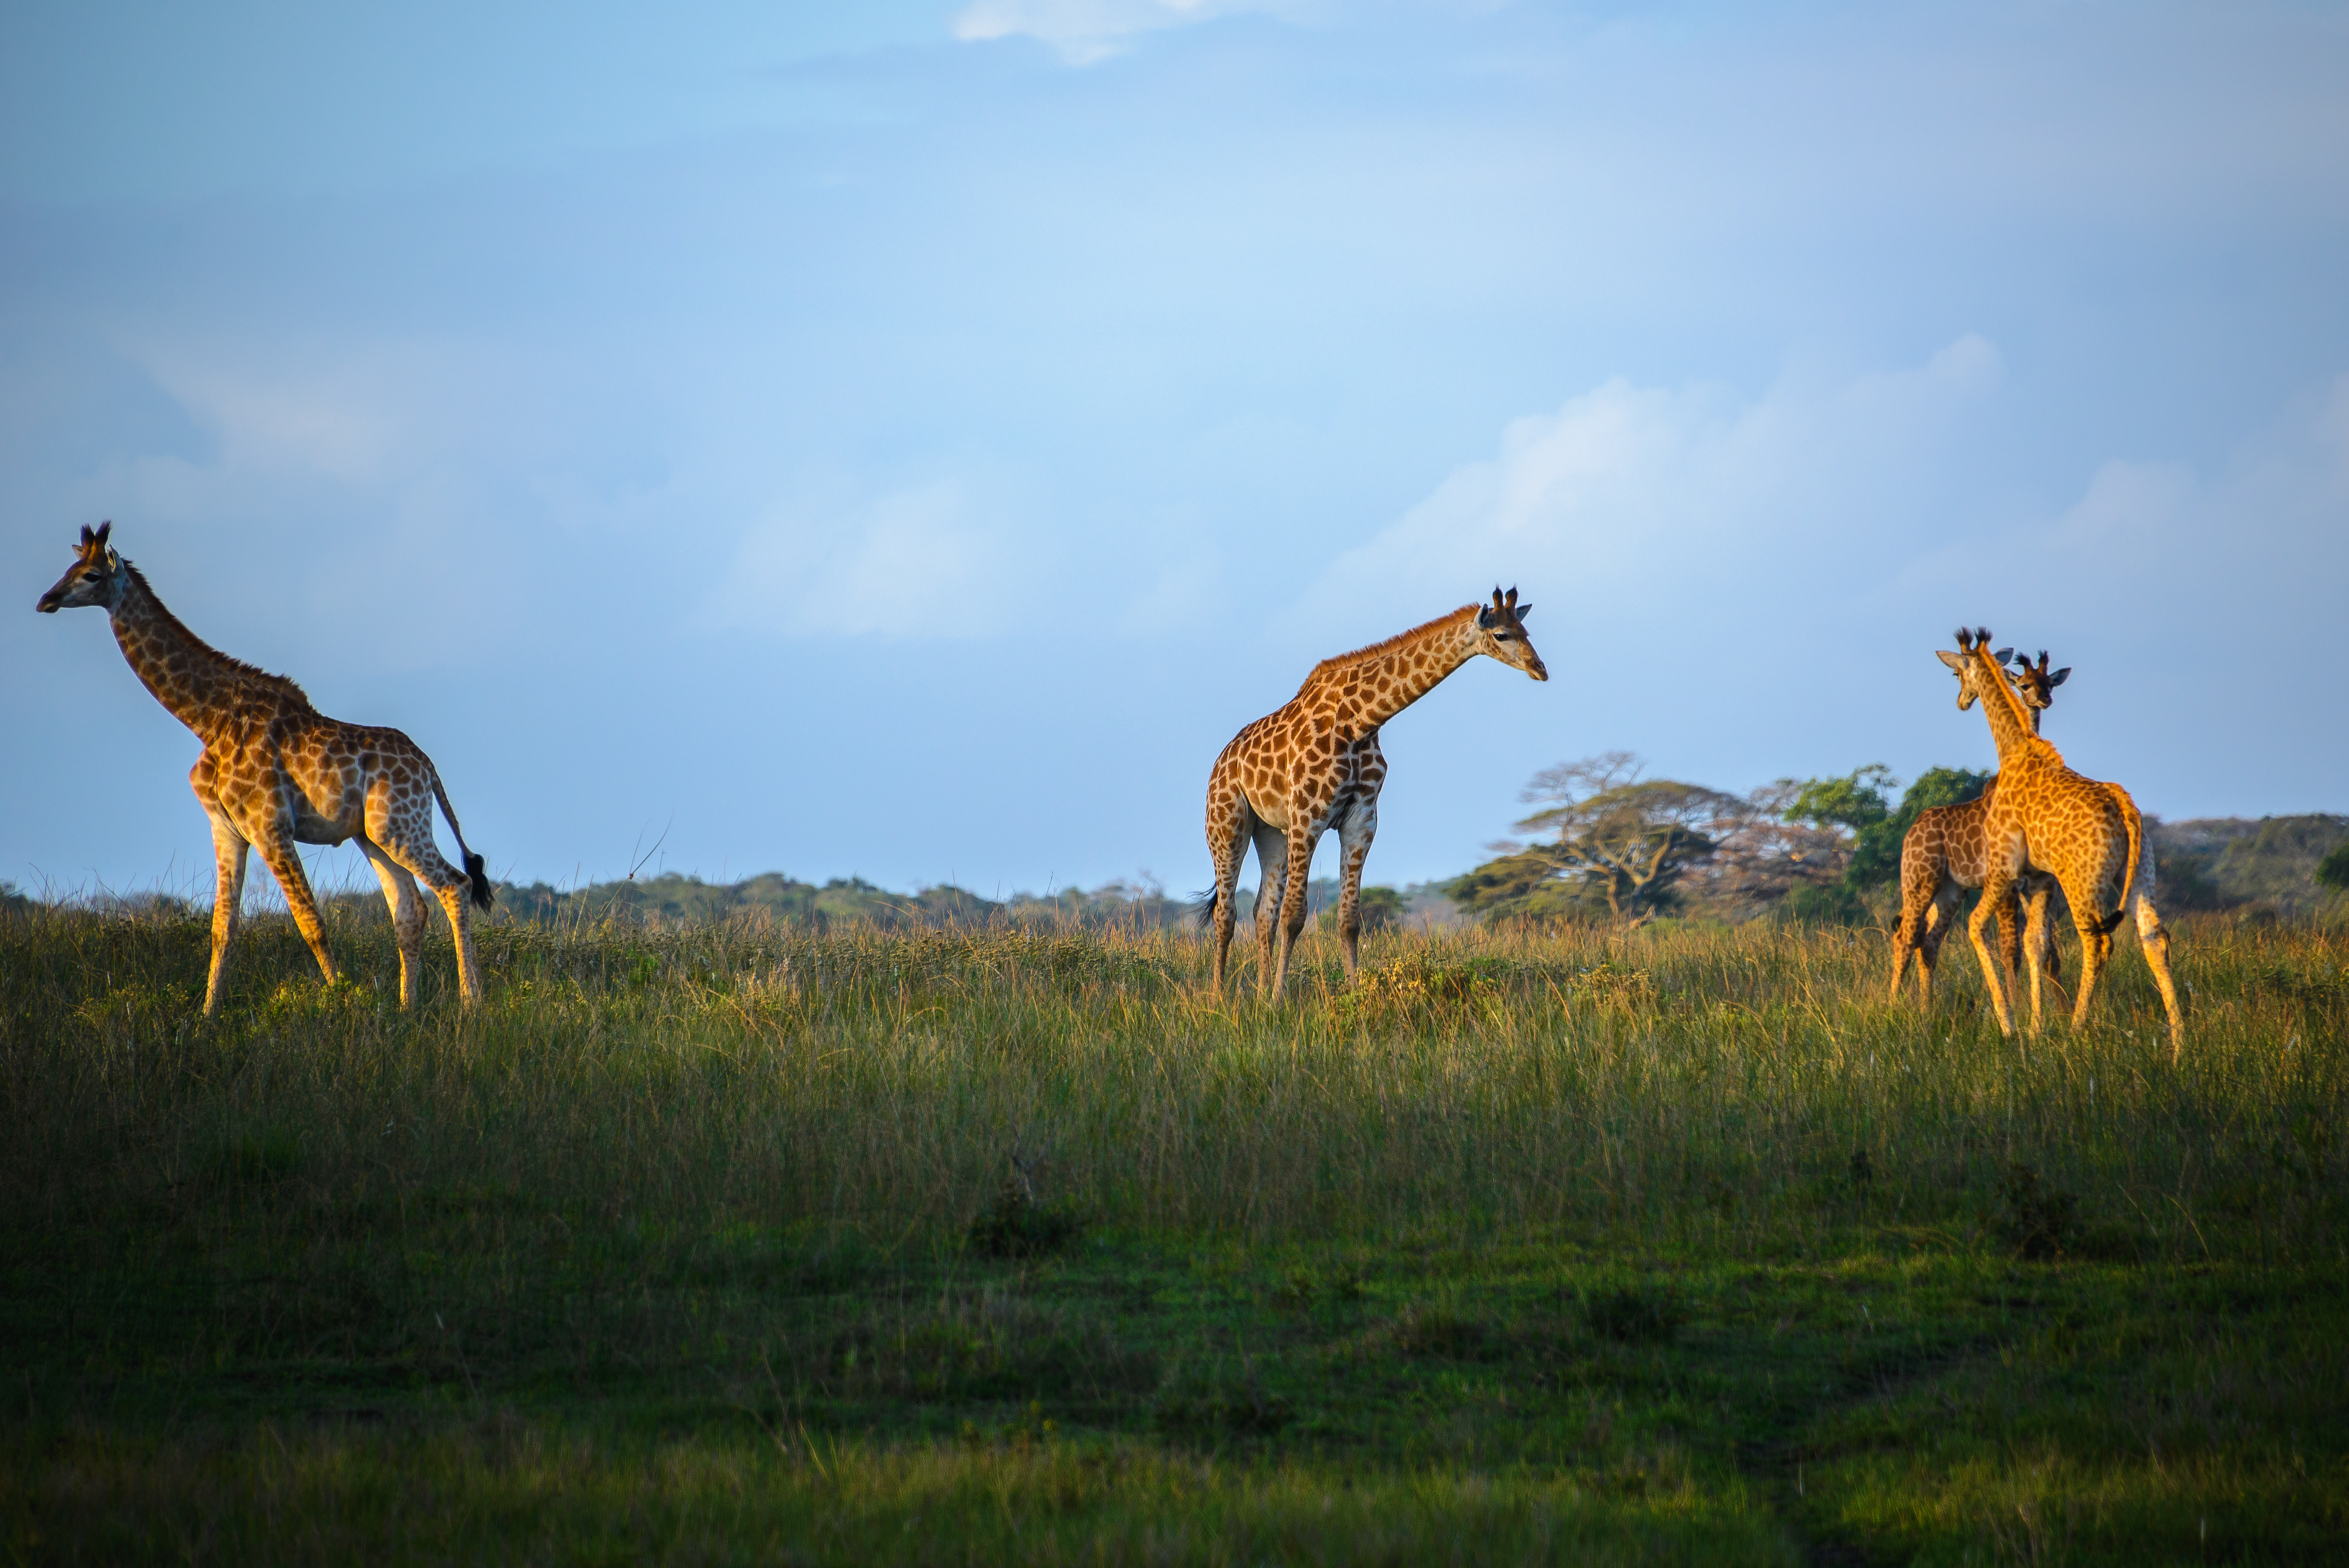 Giraffen bei einer Bush Safari in Südafrika